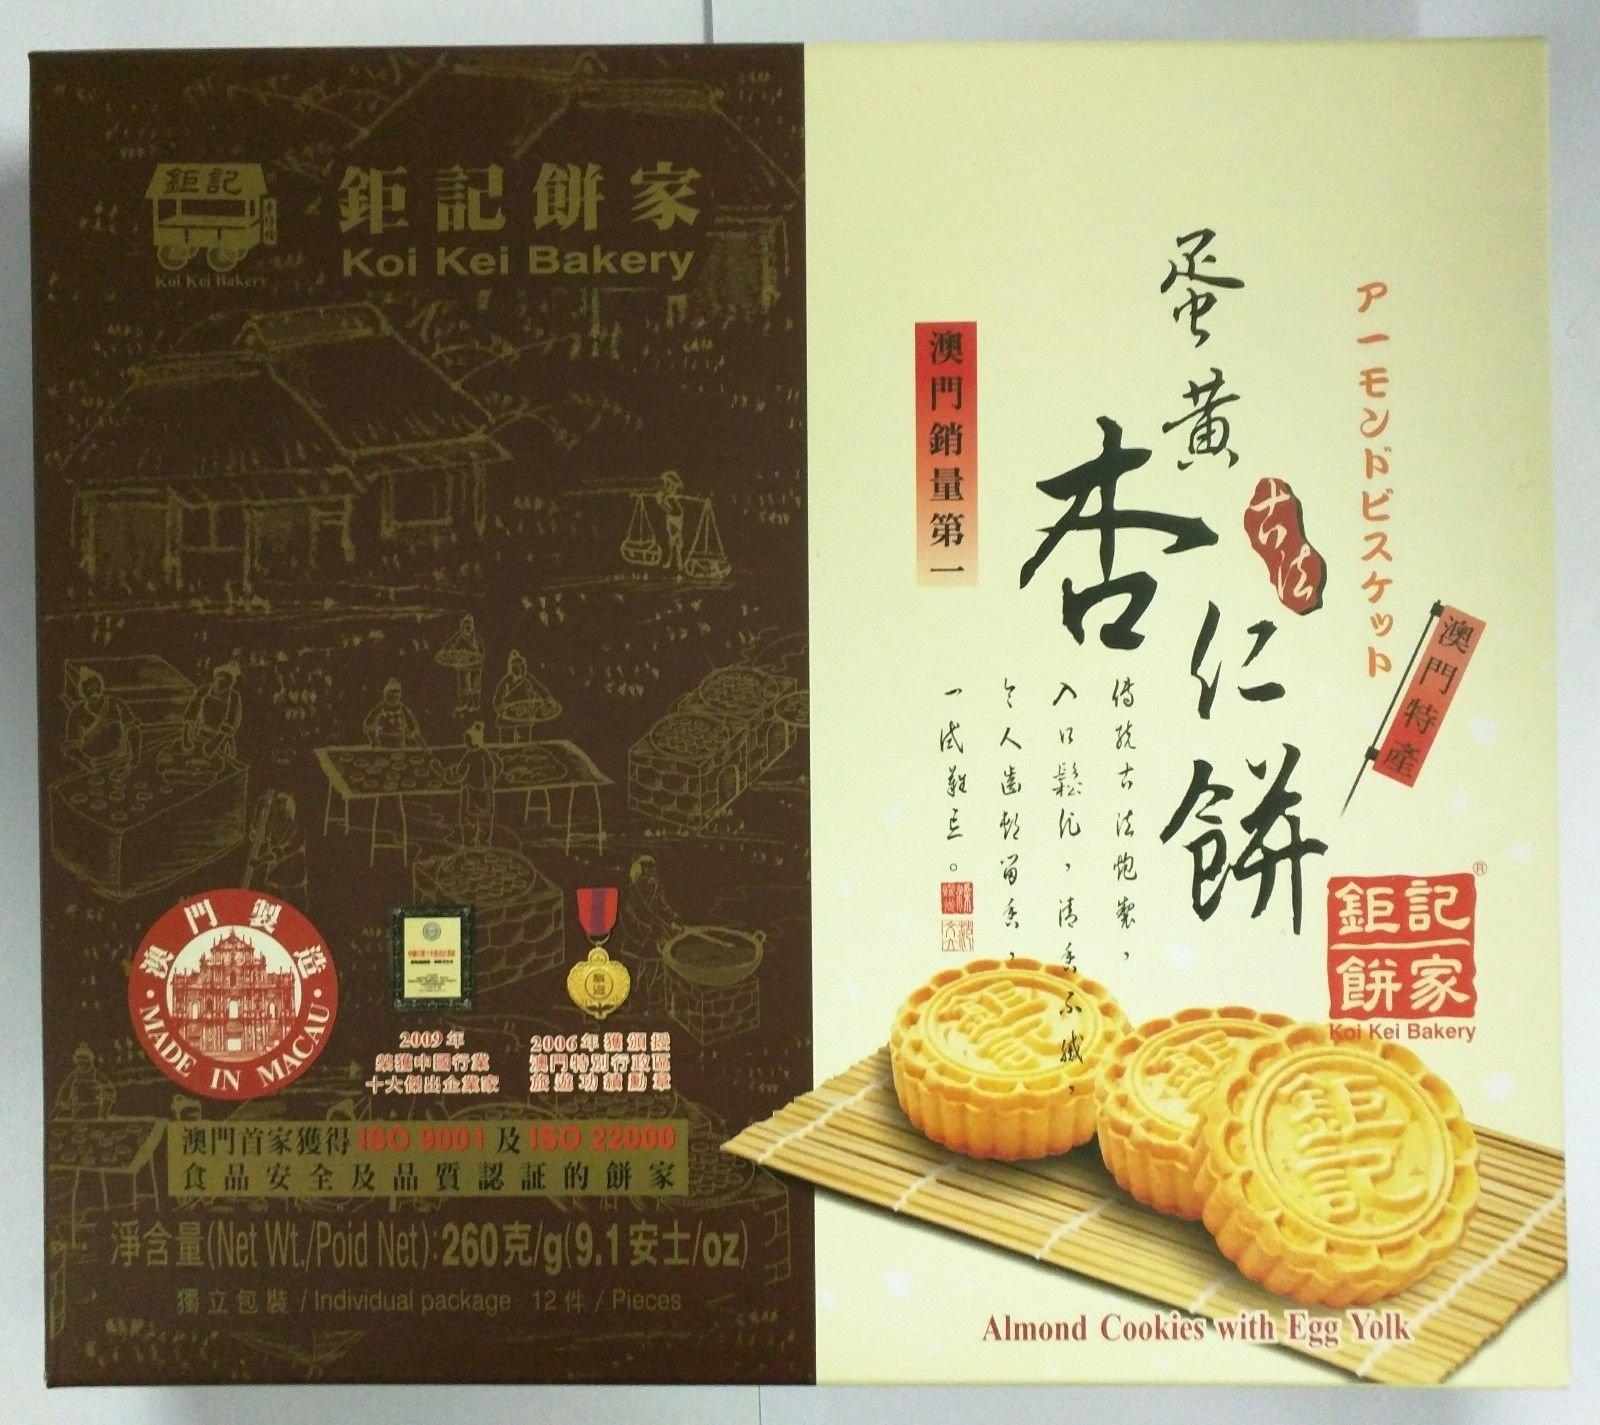 Macau Koi Kei Bakery Almond cookies box set (Egg Yolk)